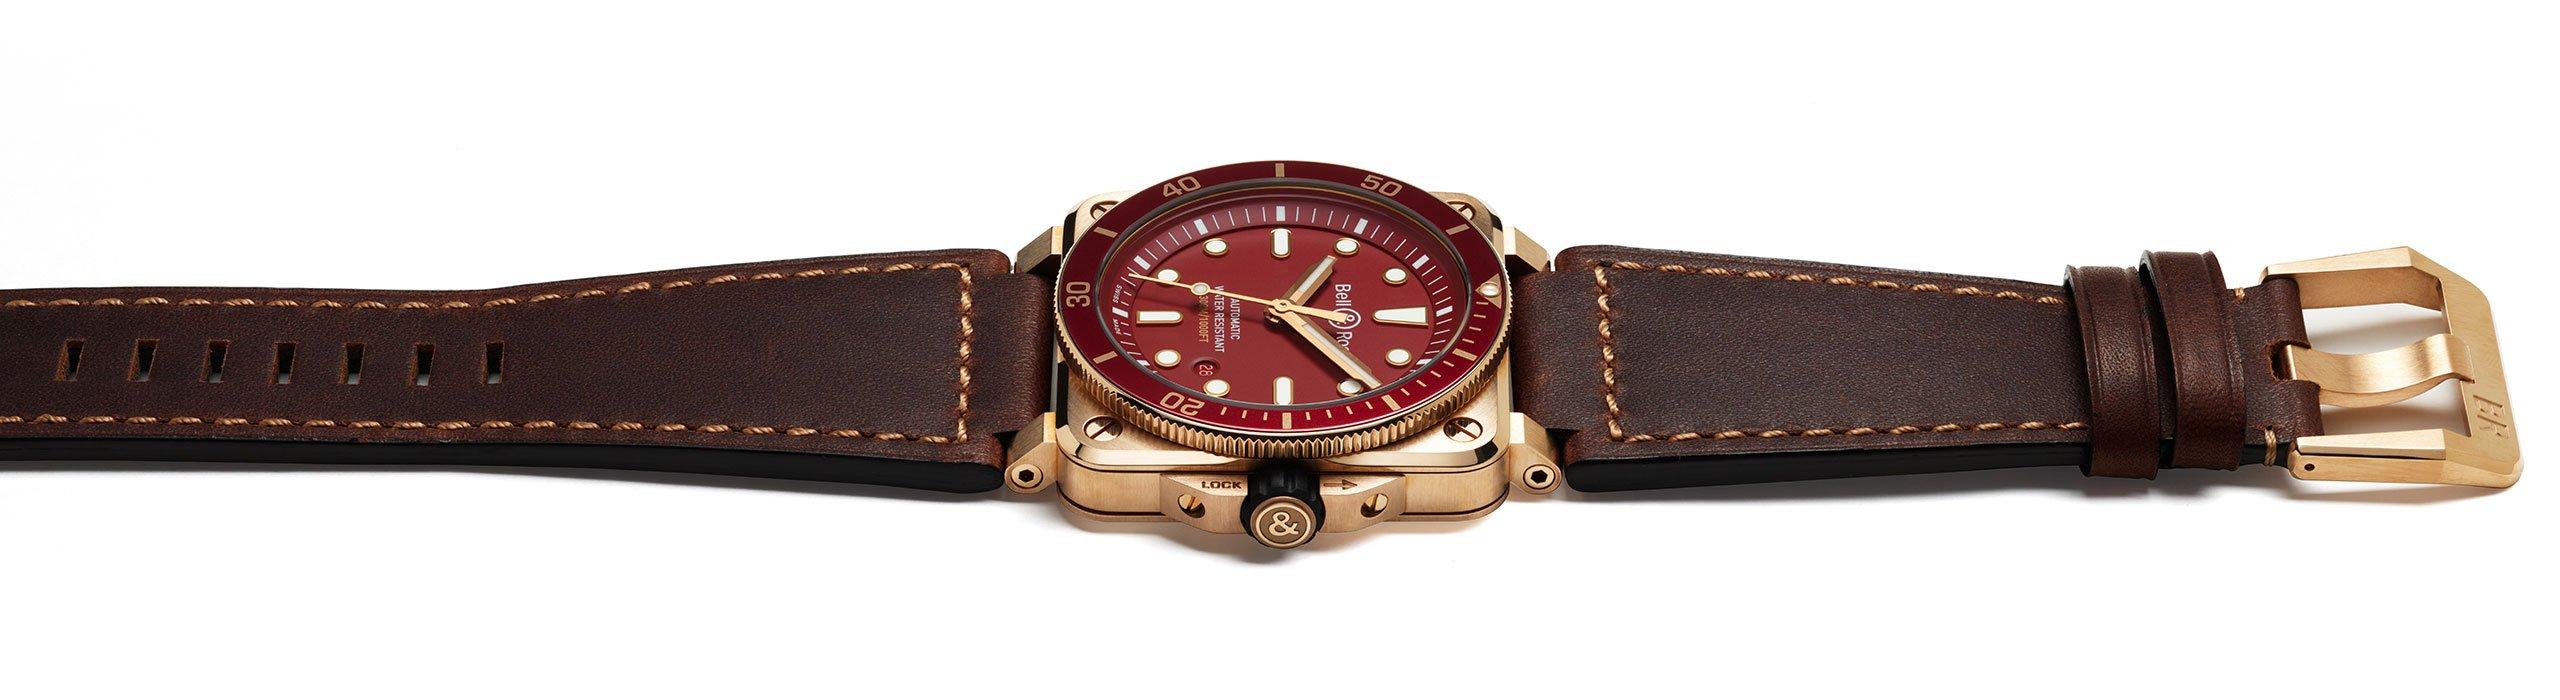 banner-top-0392-diver-red-bronze.jpg